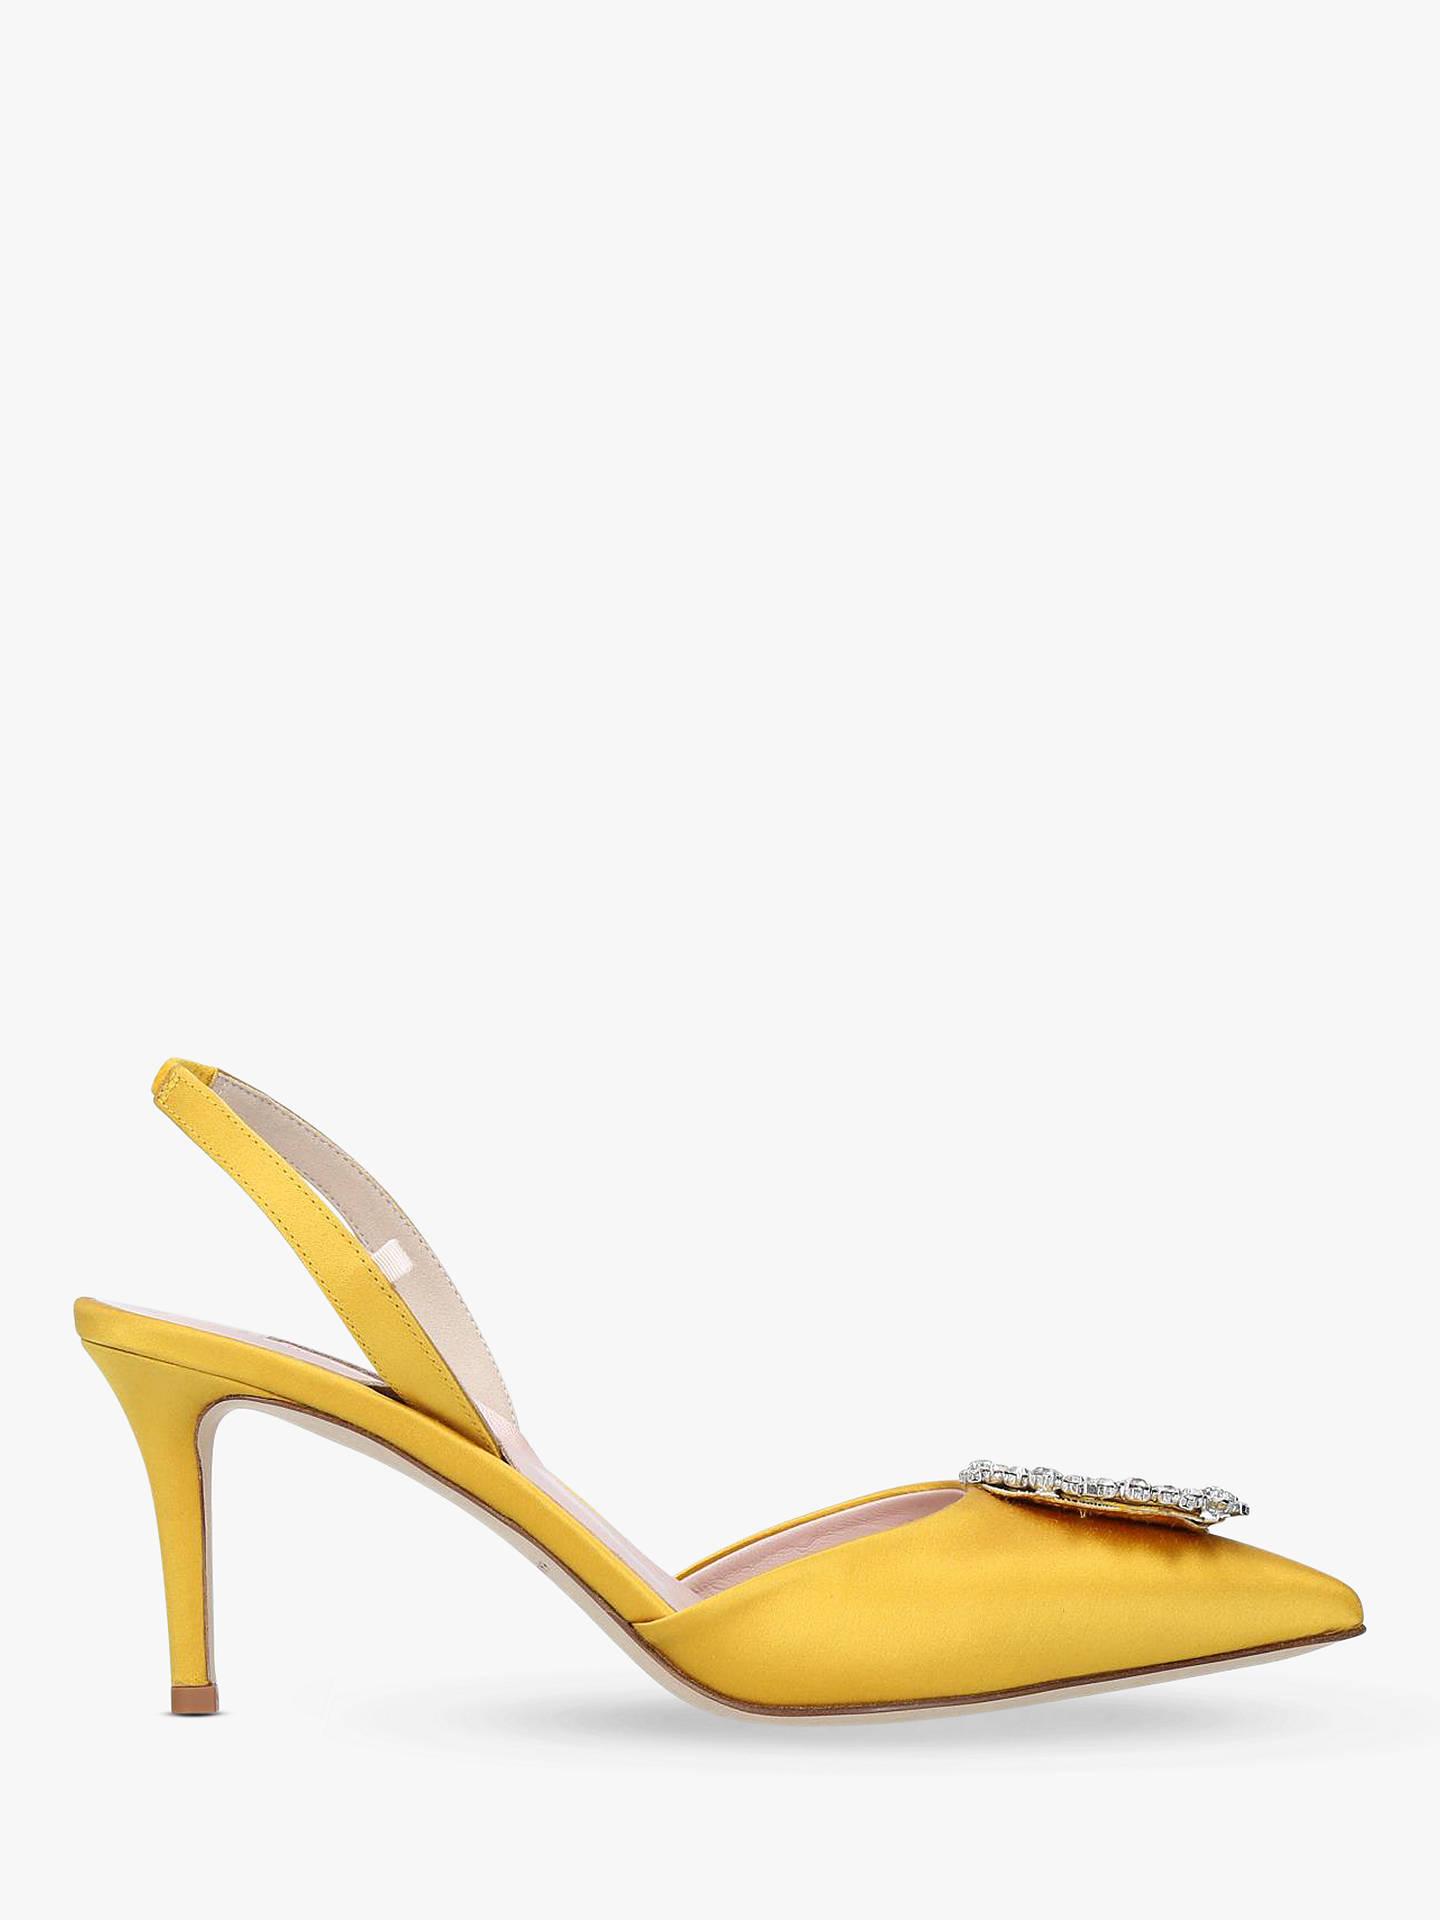 26707c114ab SJP by Sarah Jessica Parker Mabel Satin Slingback Court Shoes ...